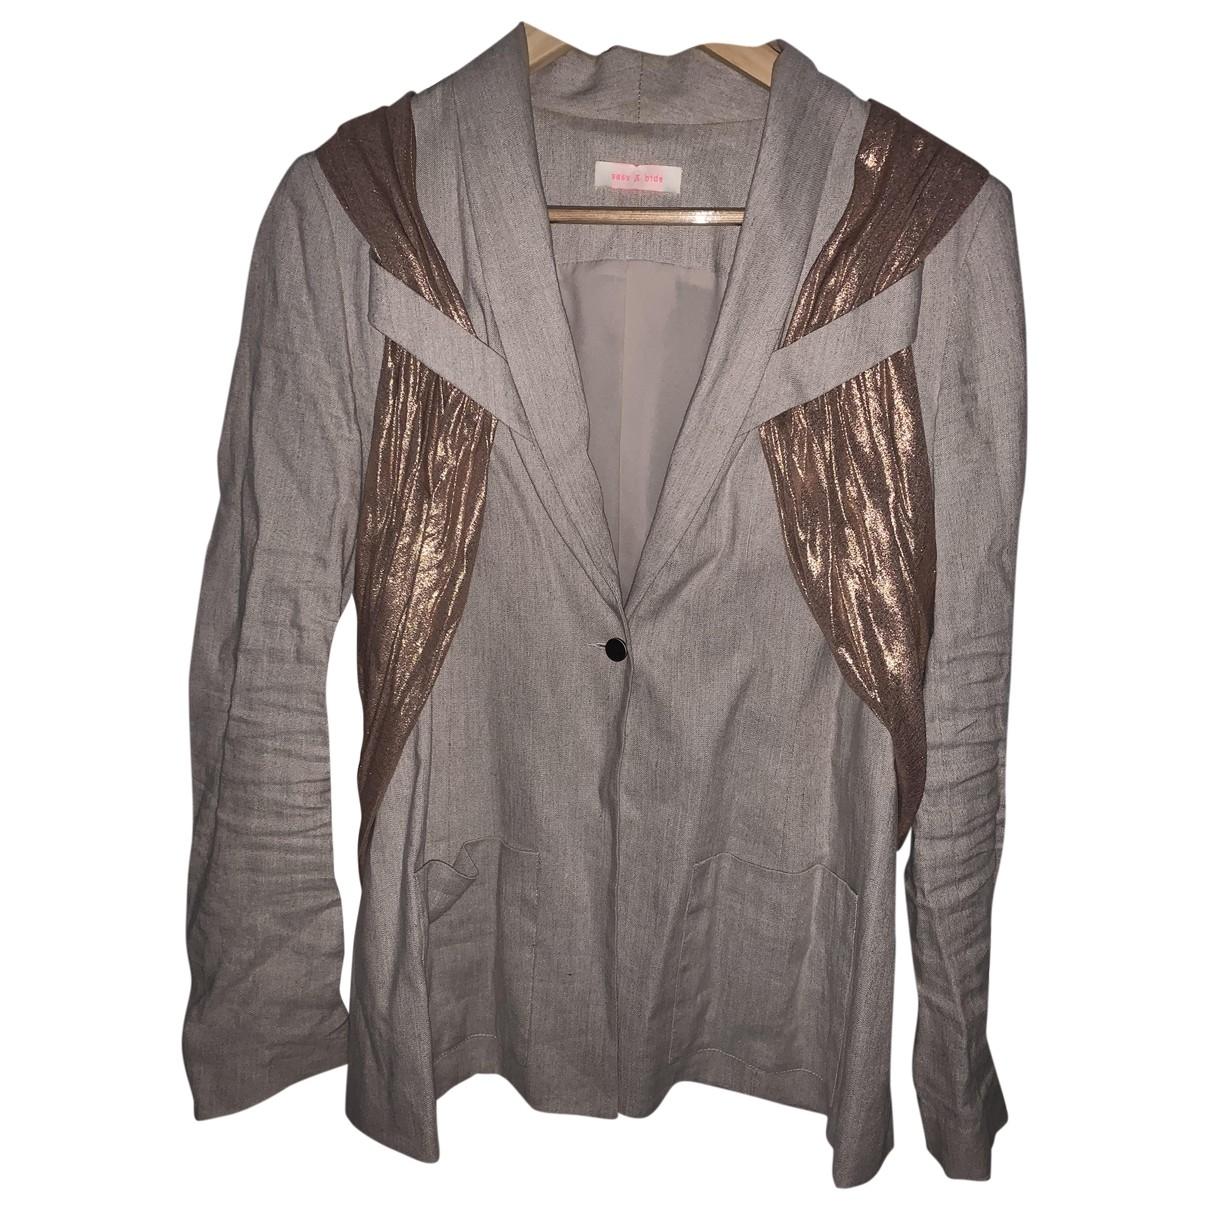 Sass & Bide \N Beige Linen jacket for Women 8 UK